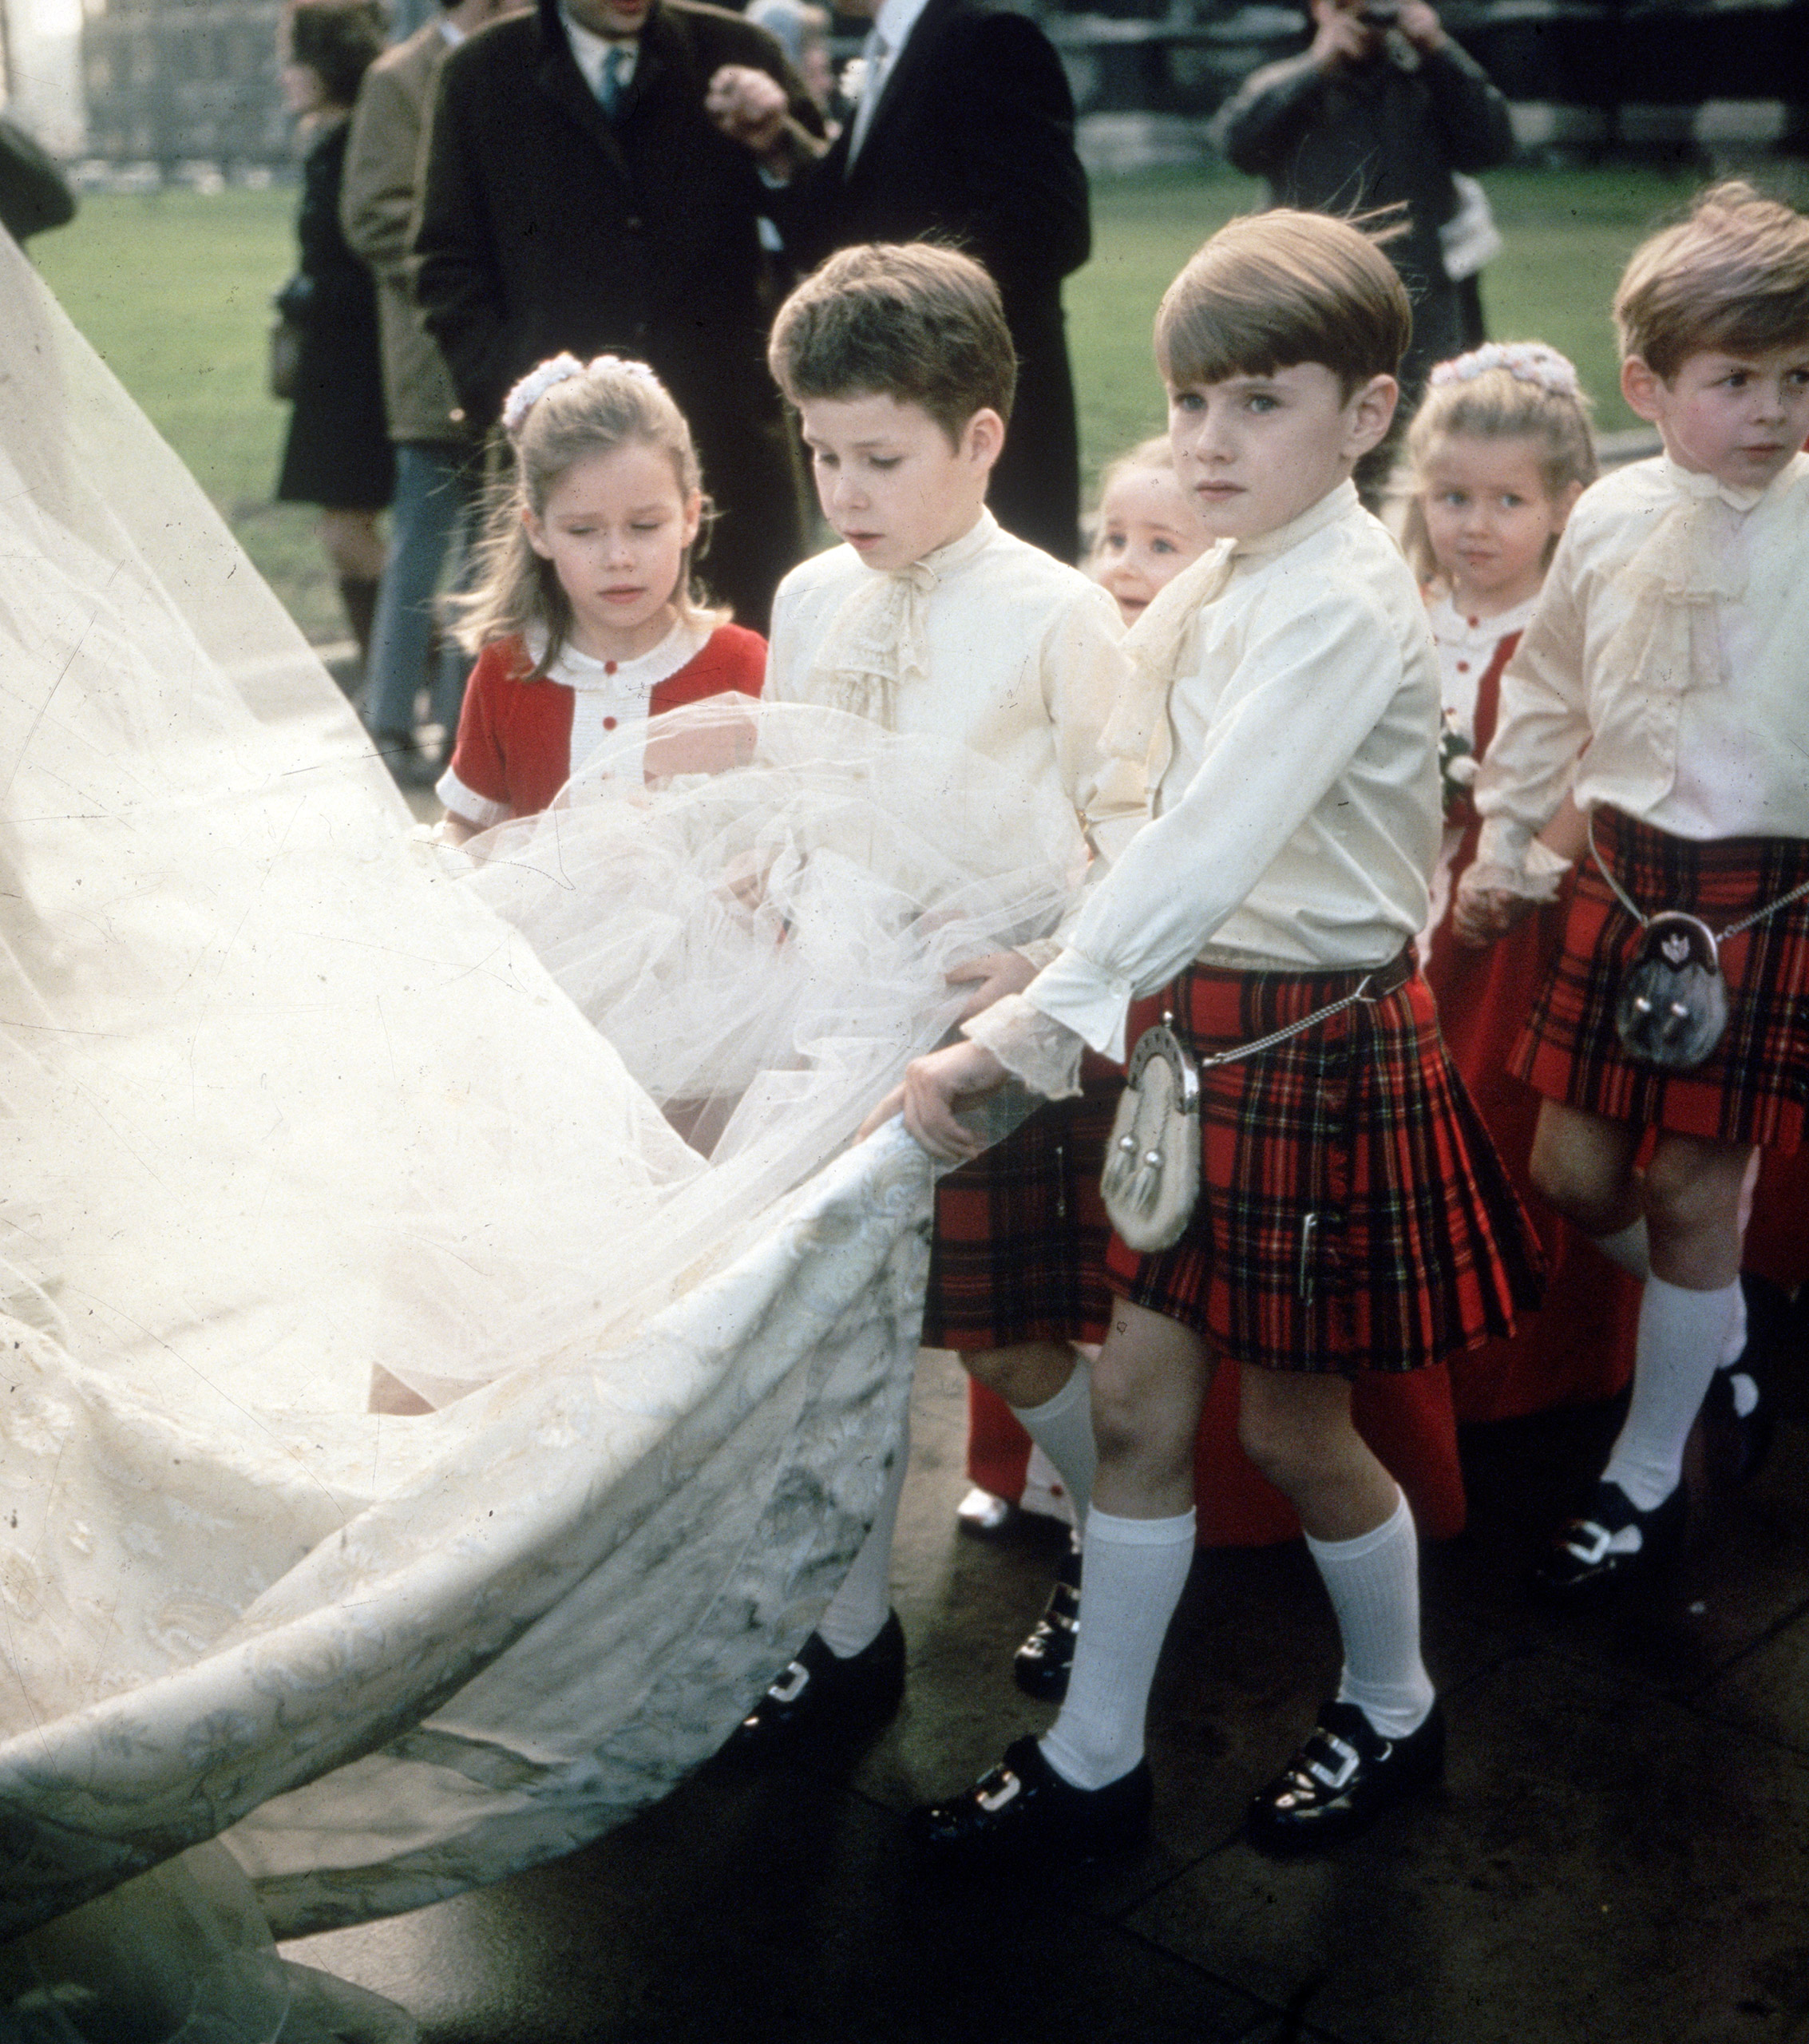 Princess Margaret's children, Viscount David Linley and his sister, Sarah Armstrong-Jones, among the pageboys and bridesmaids at a society wedding. 1975.